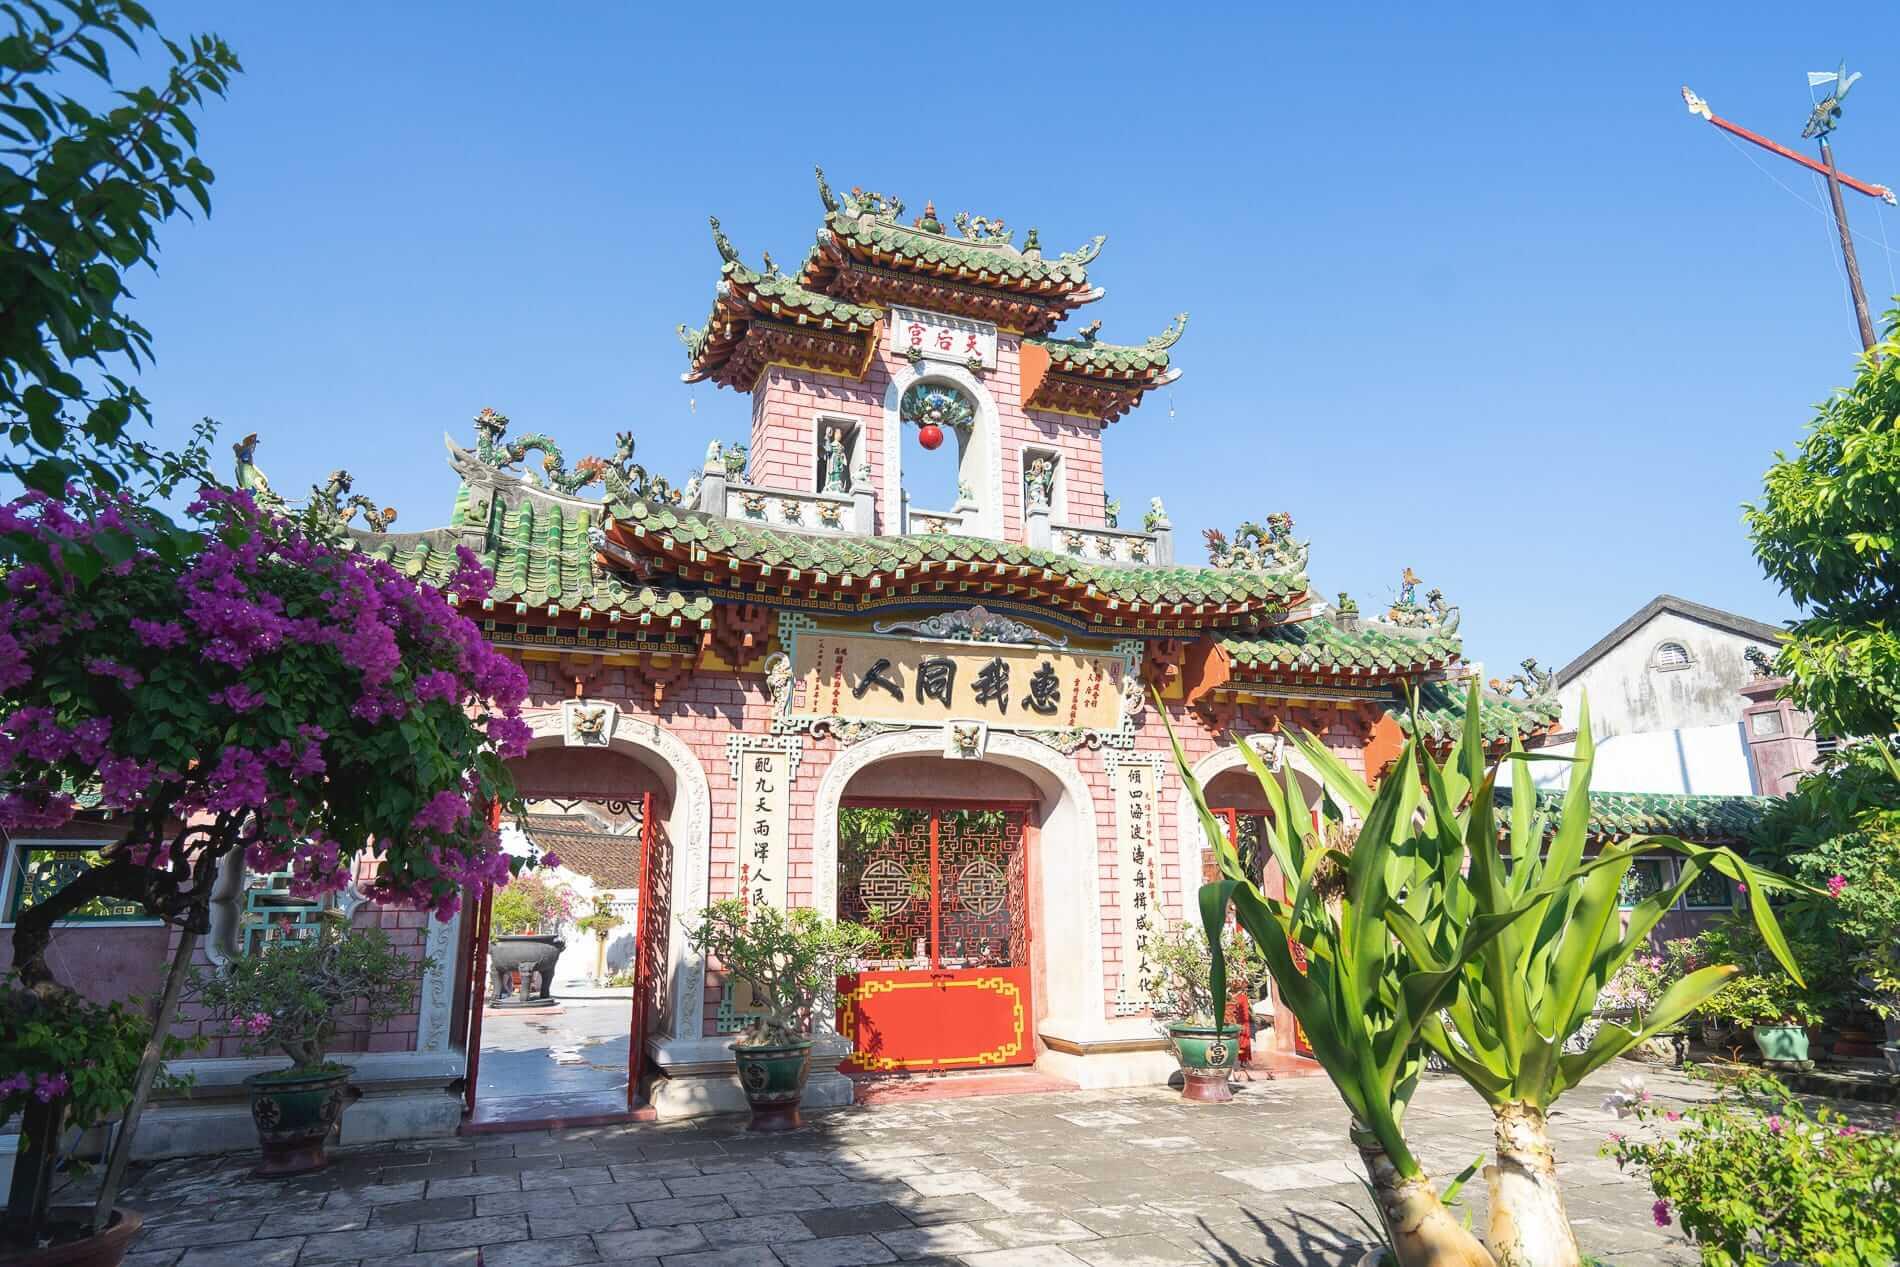 Phuc Kien Assembly Hall - Hoi An Ancient Town